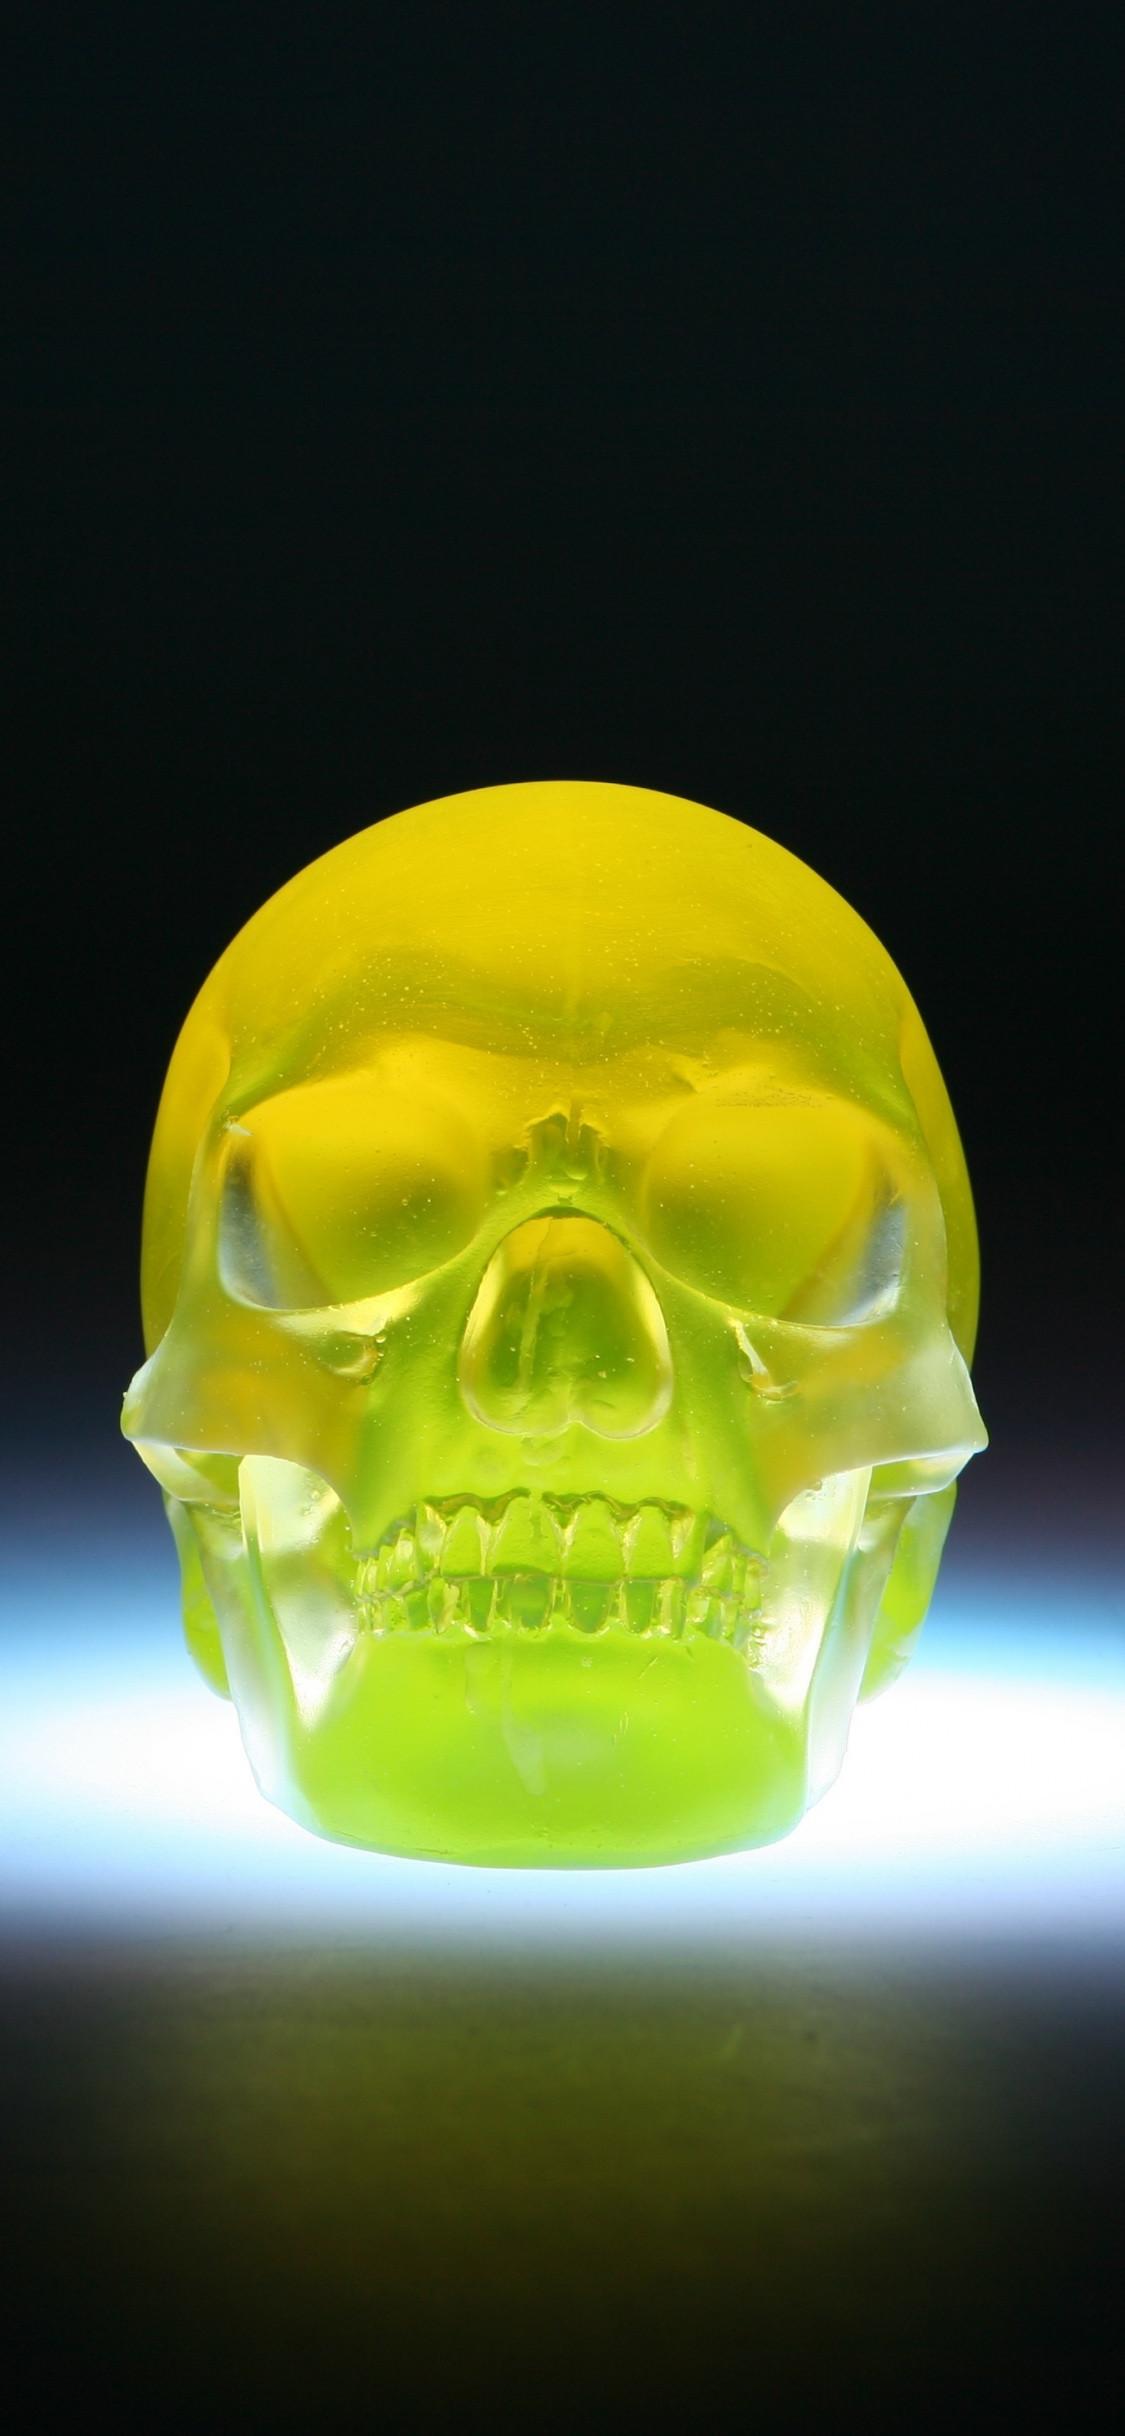 3D Skull Wallpaper (68+ pictures)